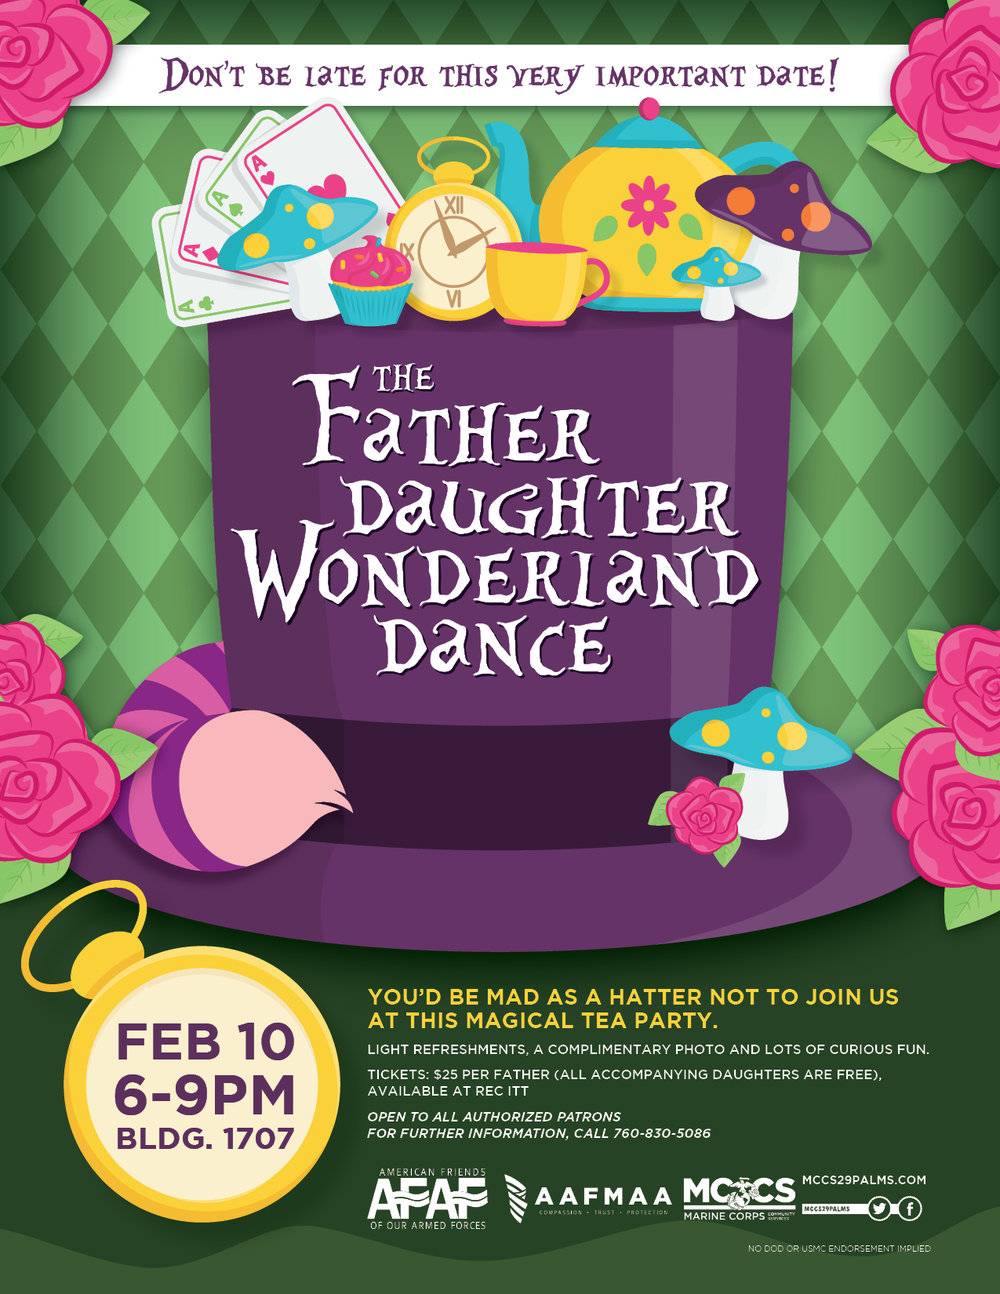 FatherDaughterDance021018_Flyer.jpg